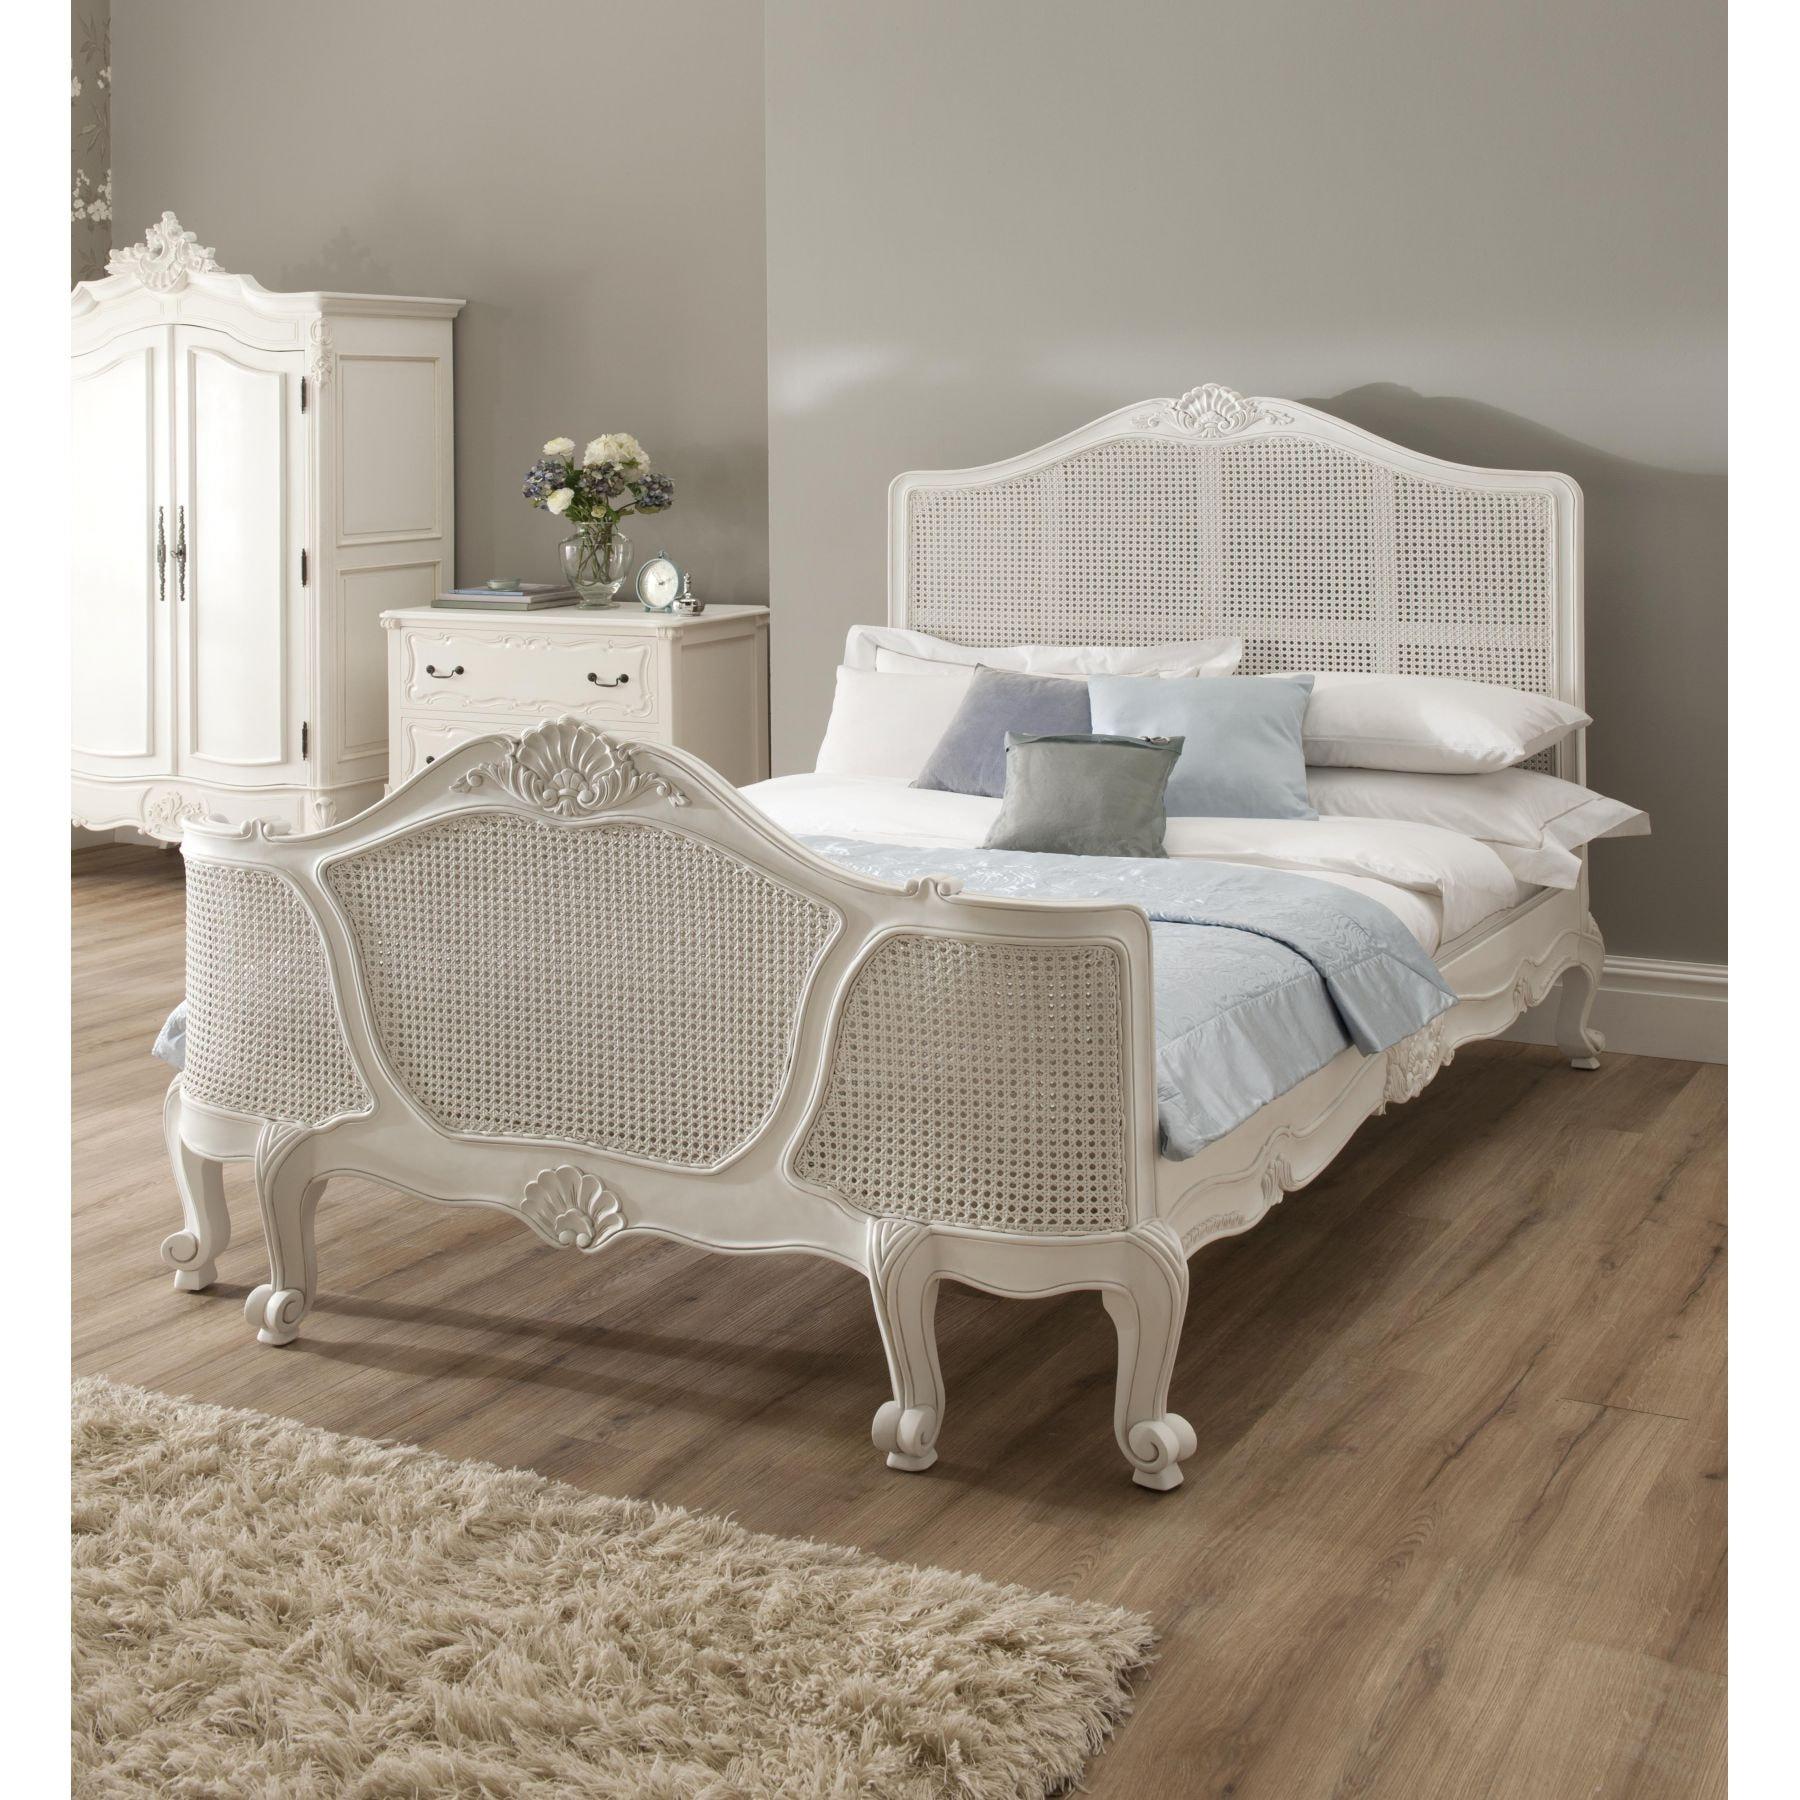 La Rochelle Antique French Rattan Bed  Size  Double    Mattress   Bundle  Deal. Rochelle Antique French Rattan Bed  Size  Double    Mattress